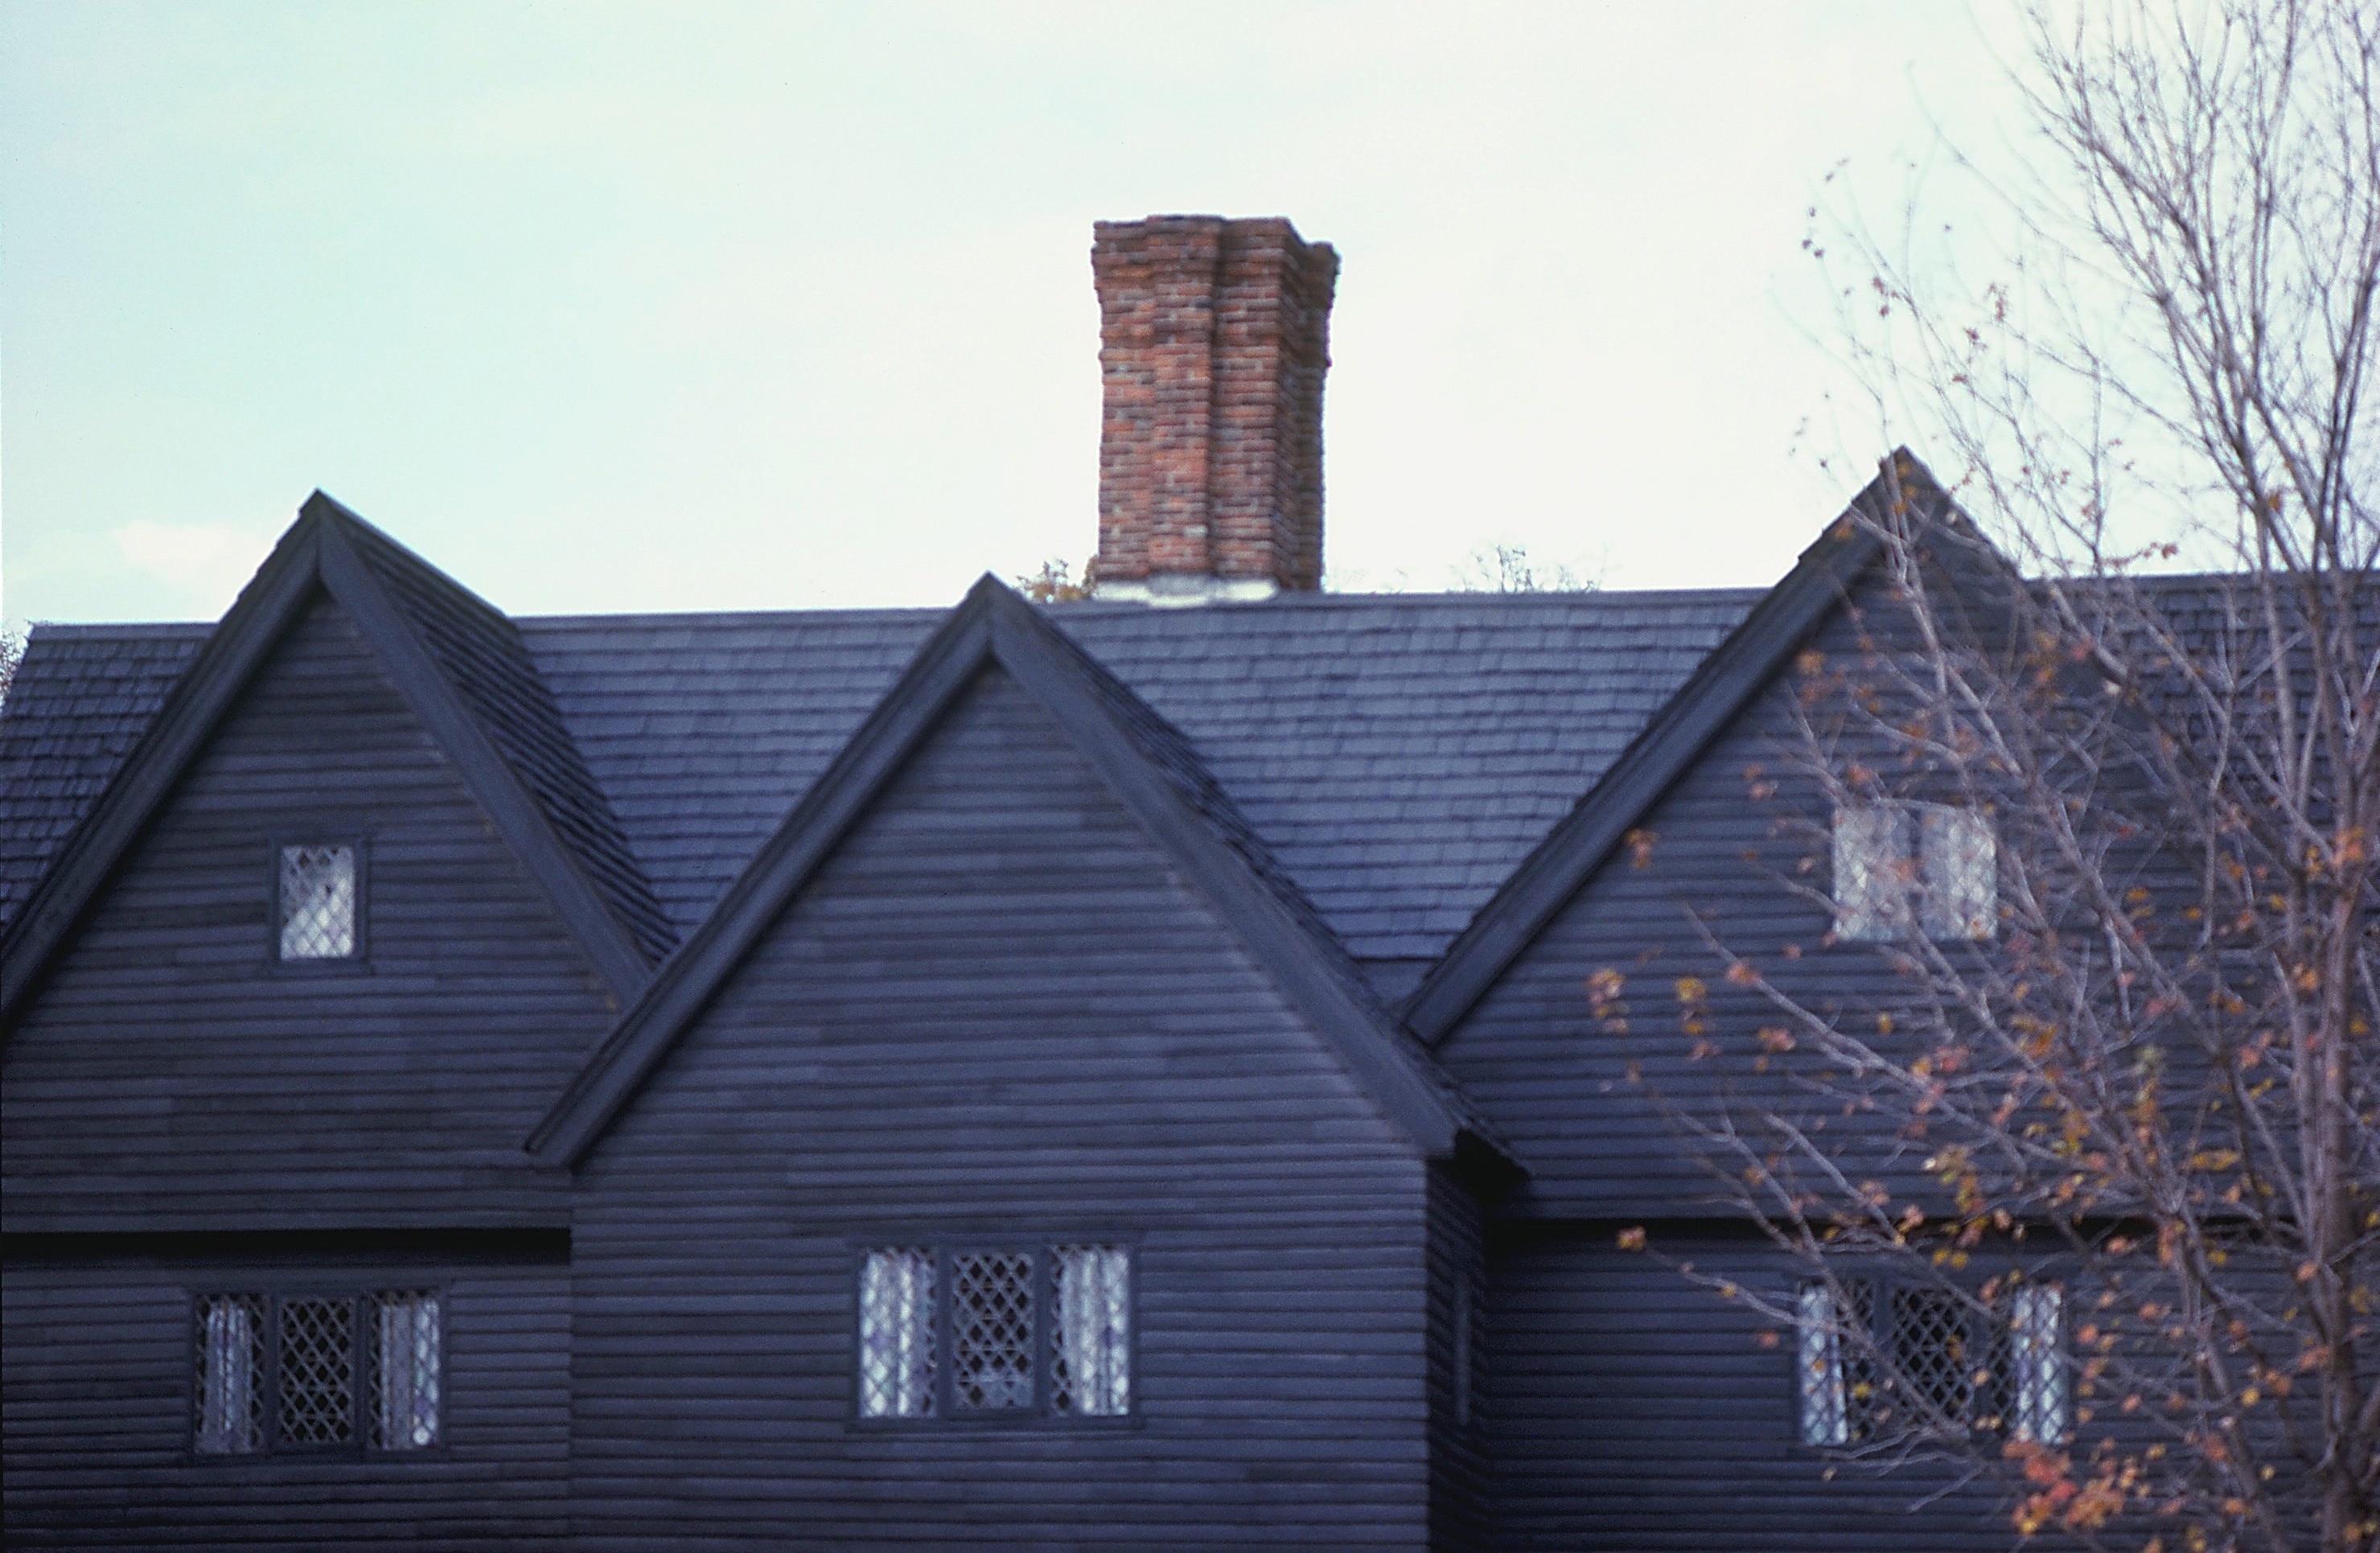 Witch House, Salem, Massachusetts, United States of America